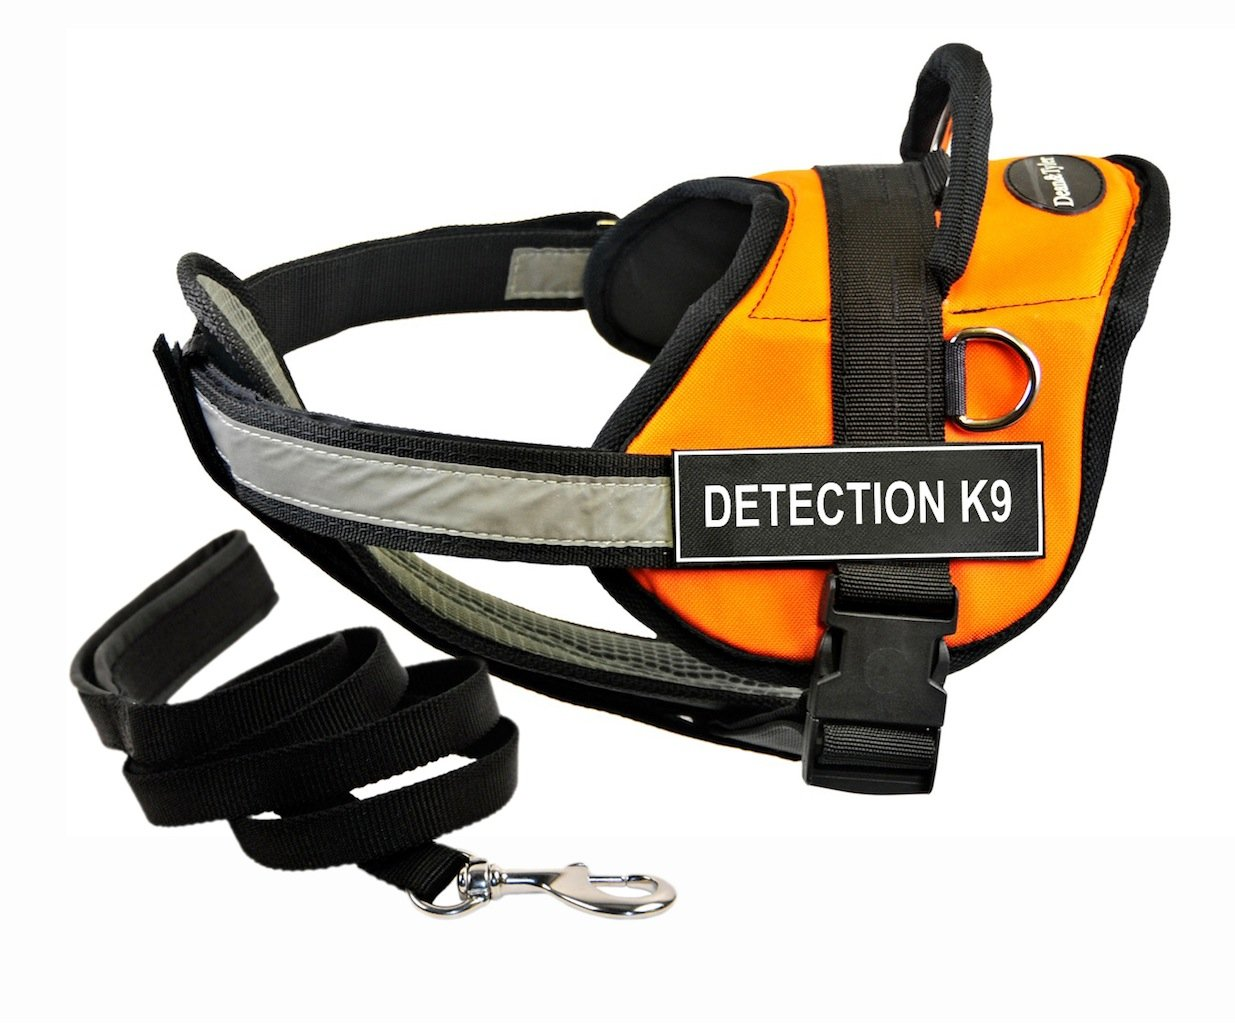 all'ingrosso a buon mercato Dean & Tyler DT Works arancia Detection Detection Detection K9 Torace Imbracatura con Imbottitura, XS, e Nero 1,8 m Padded Puppy guinzaglio.  vendite online